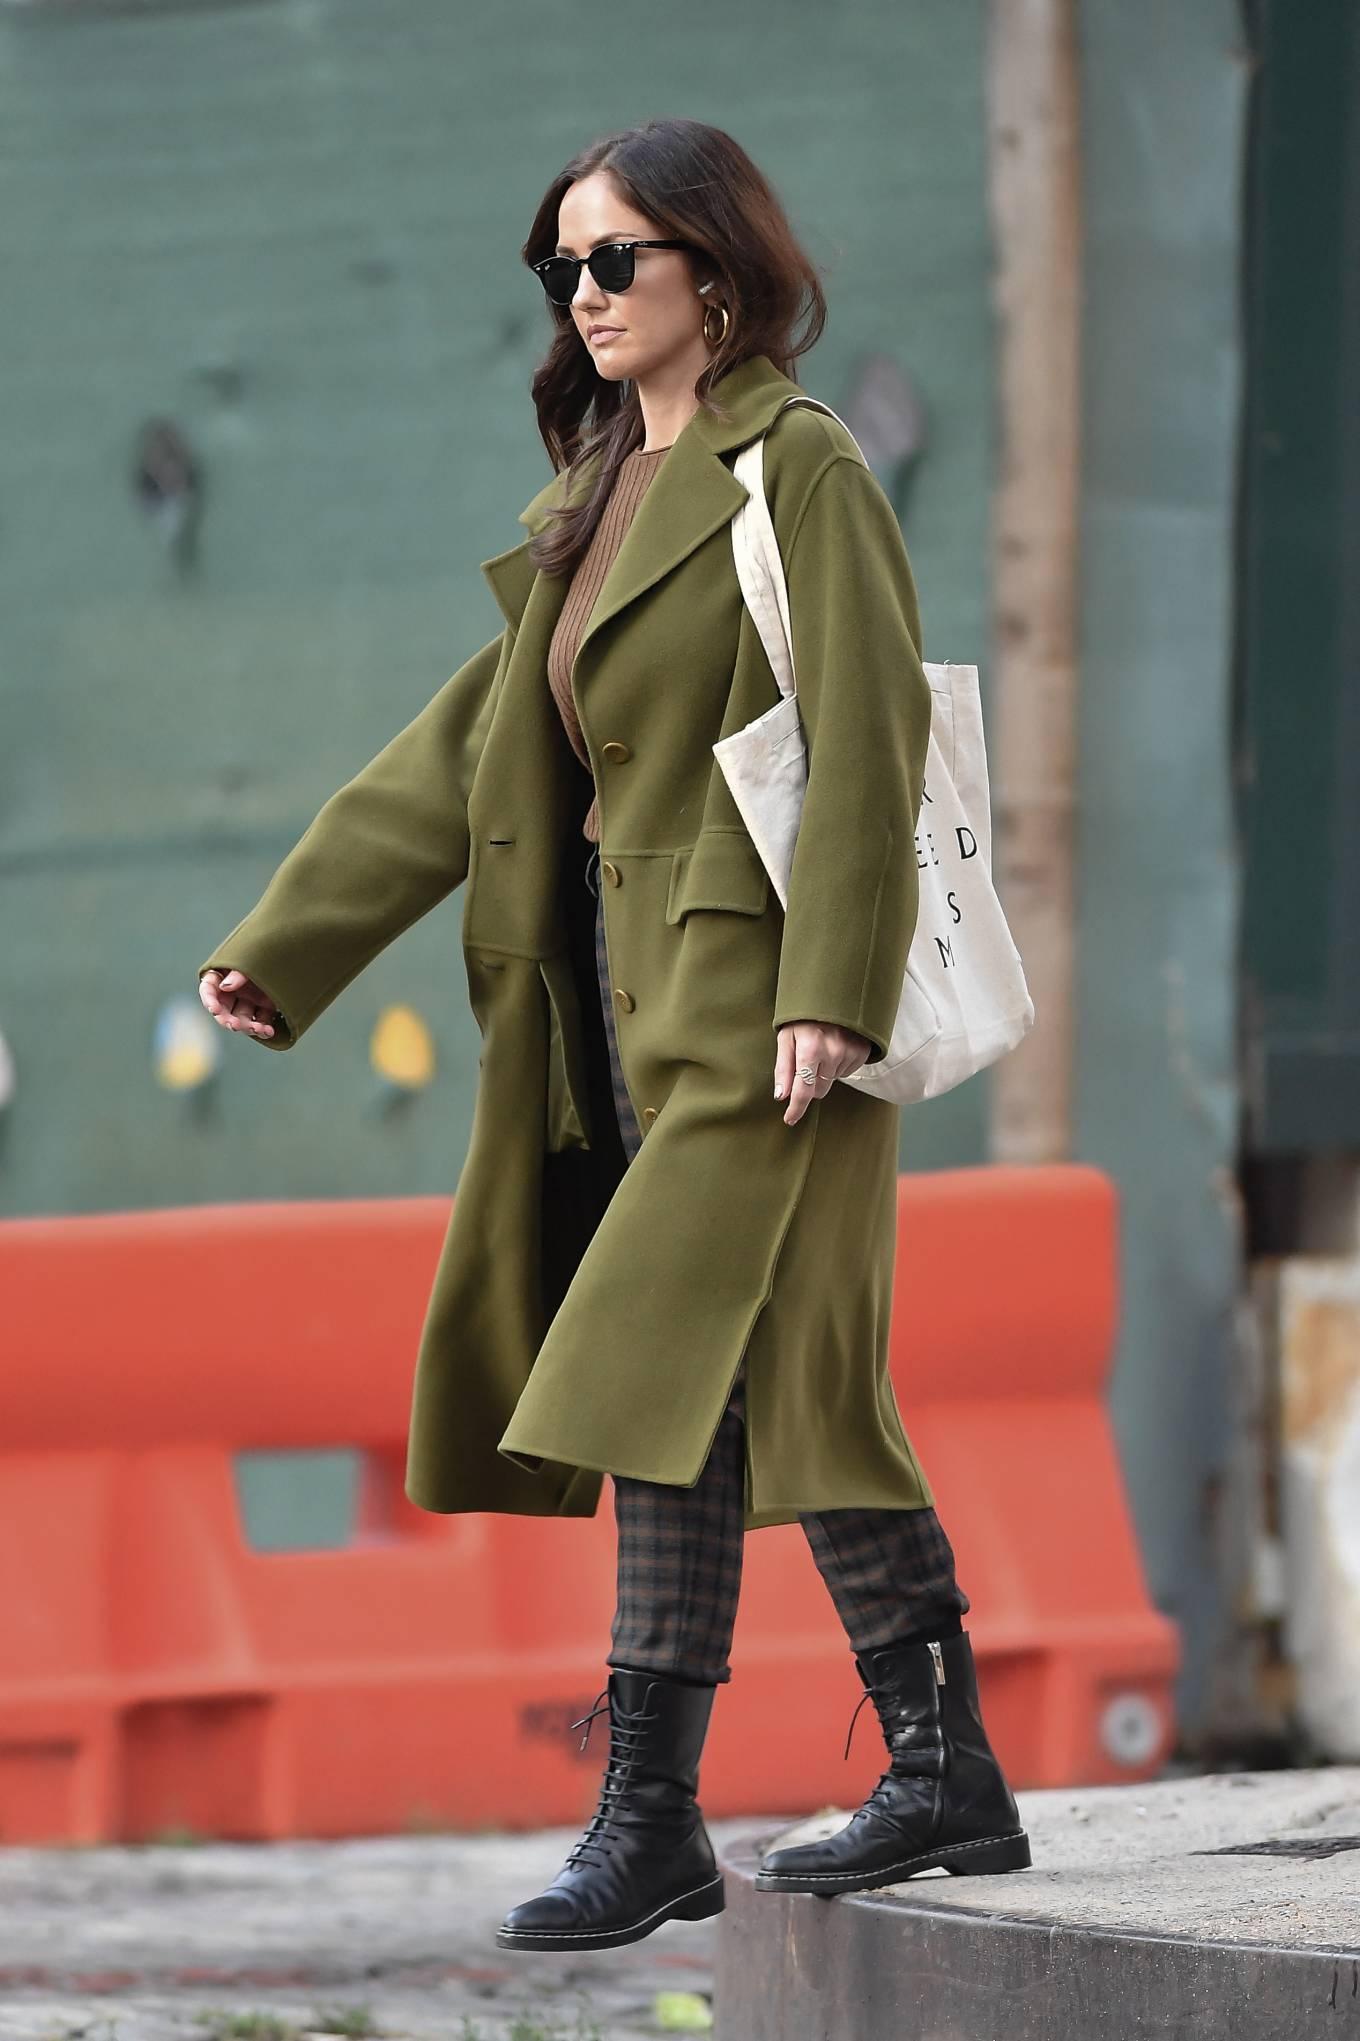 Minka Kelly 2021 : Minka Kelly – In olive green runs errands in New York-20